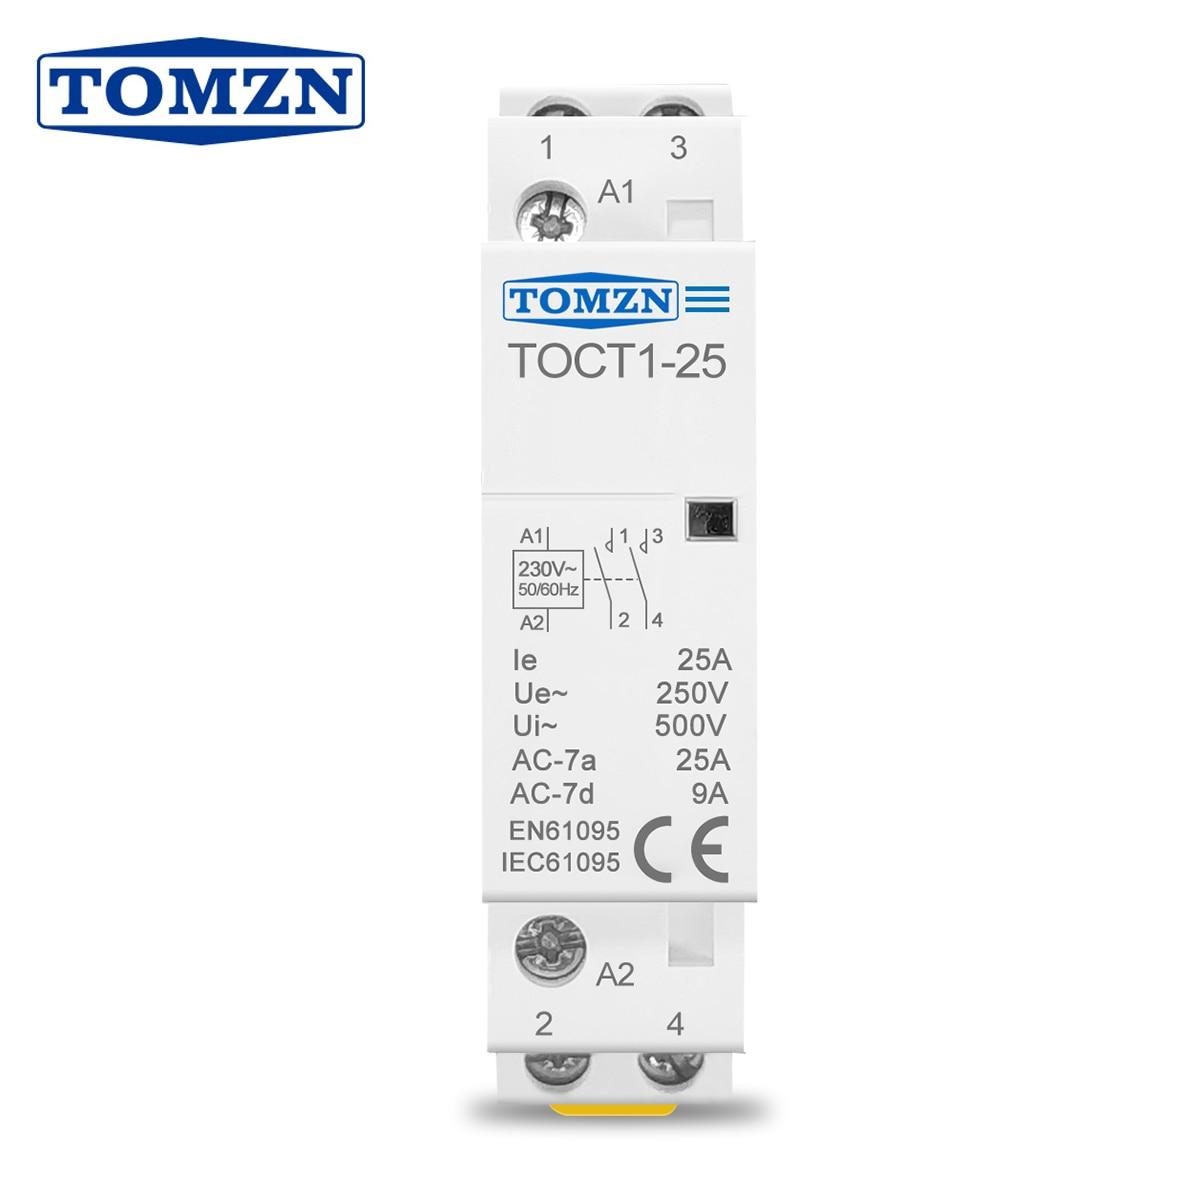 Contactor modular TOCT1 2P 25A 220V/230V 50/60HZ para el hogar, Contactor modular...